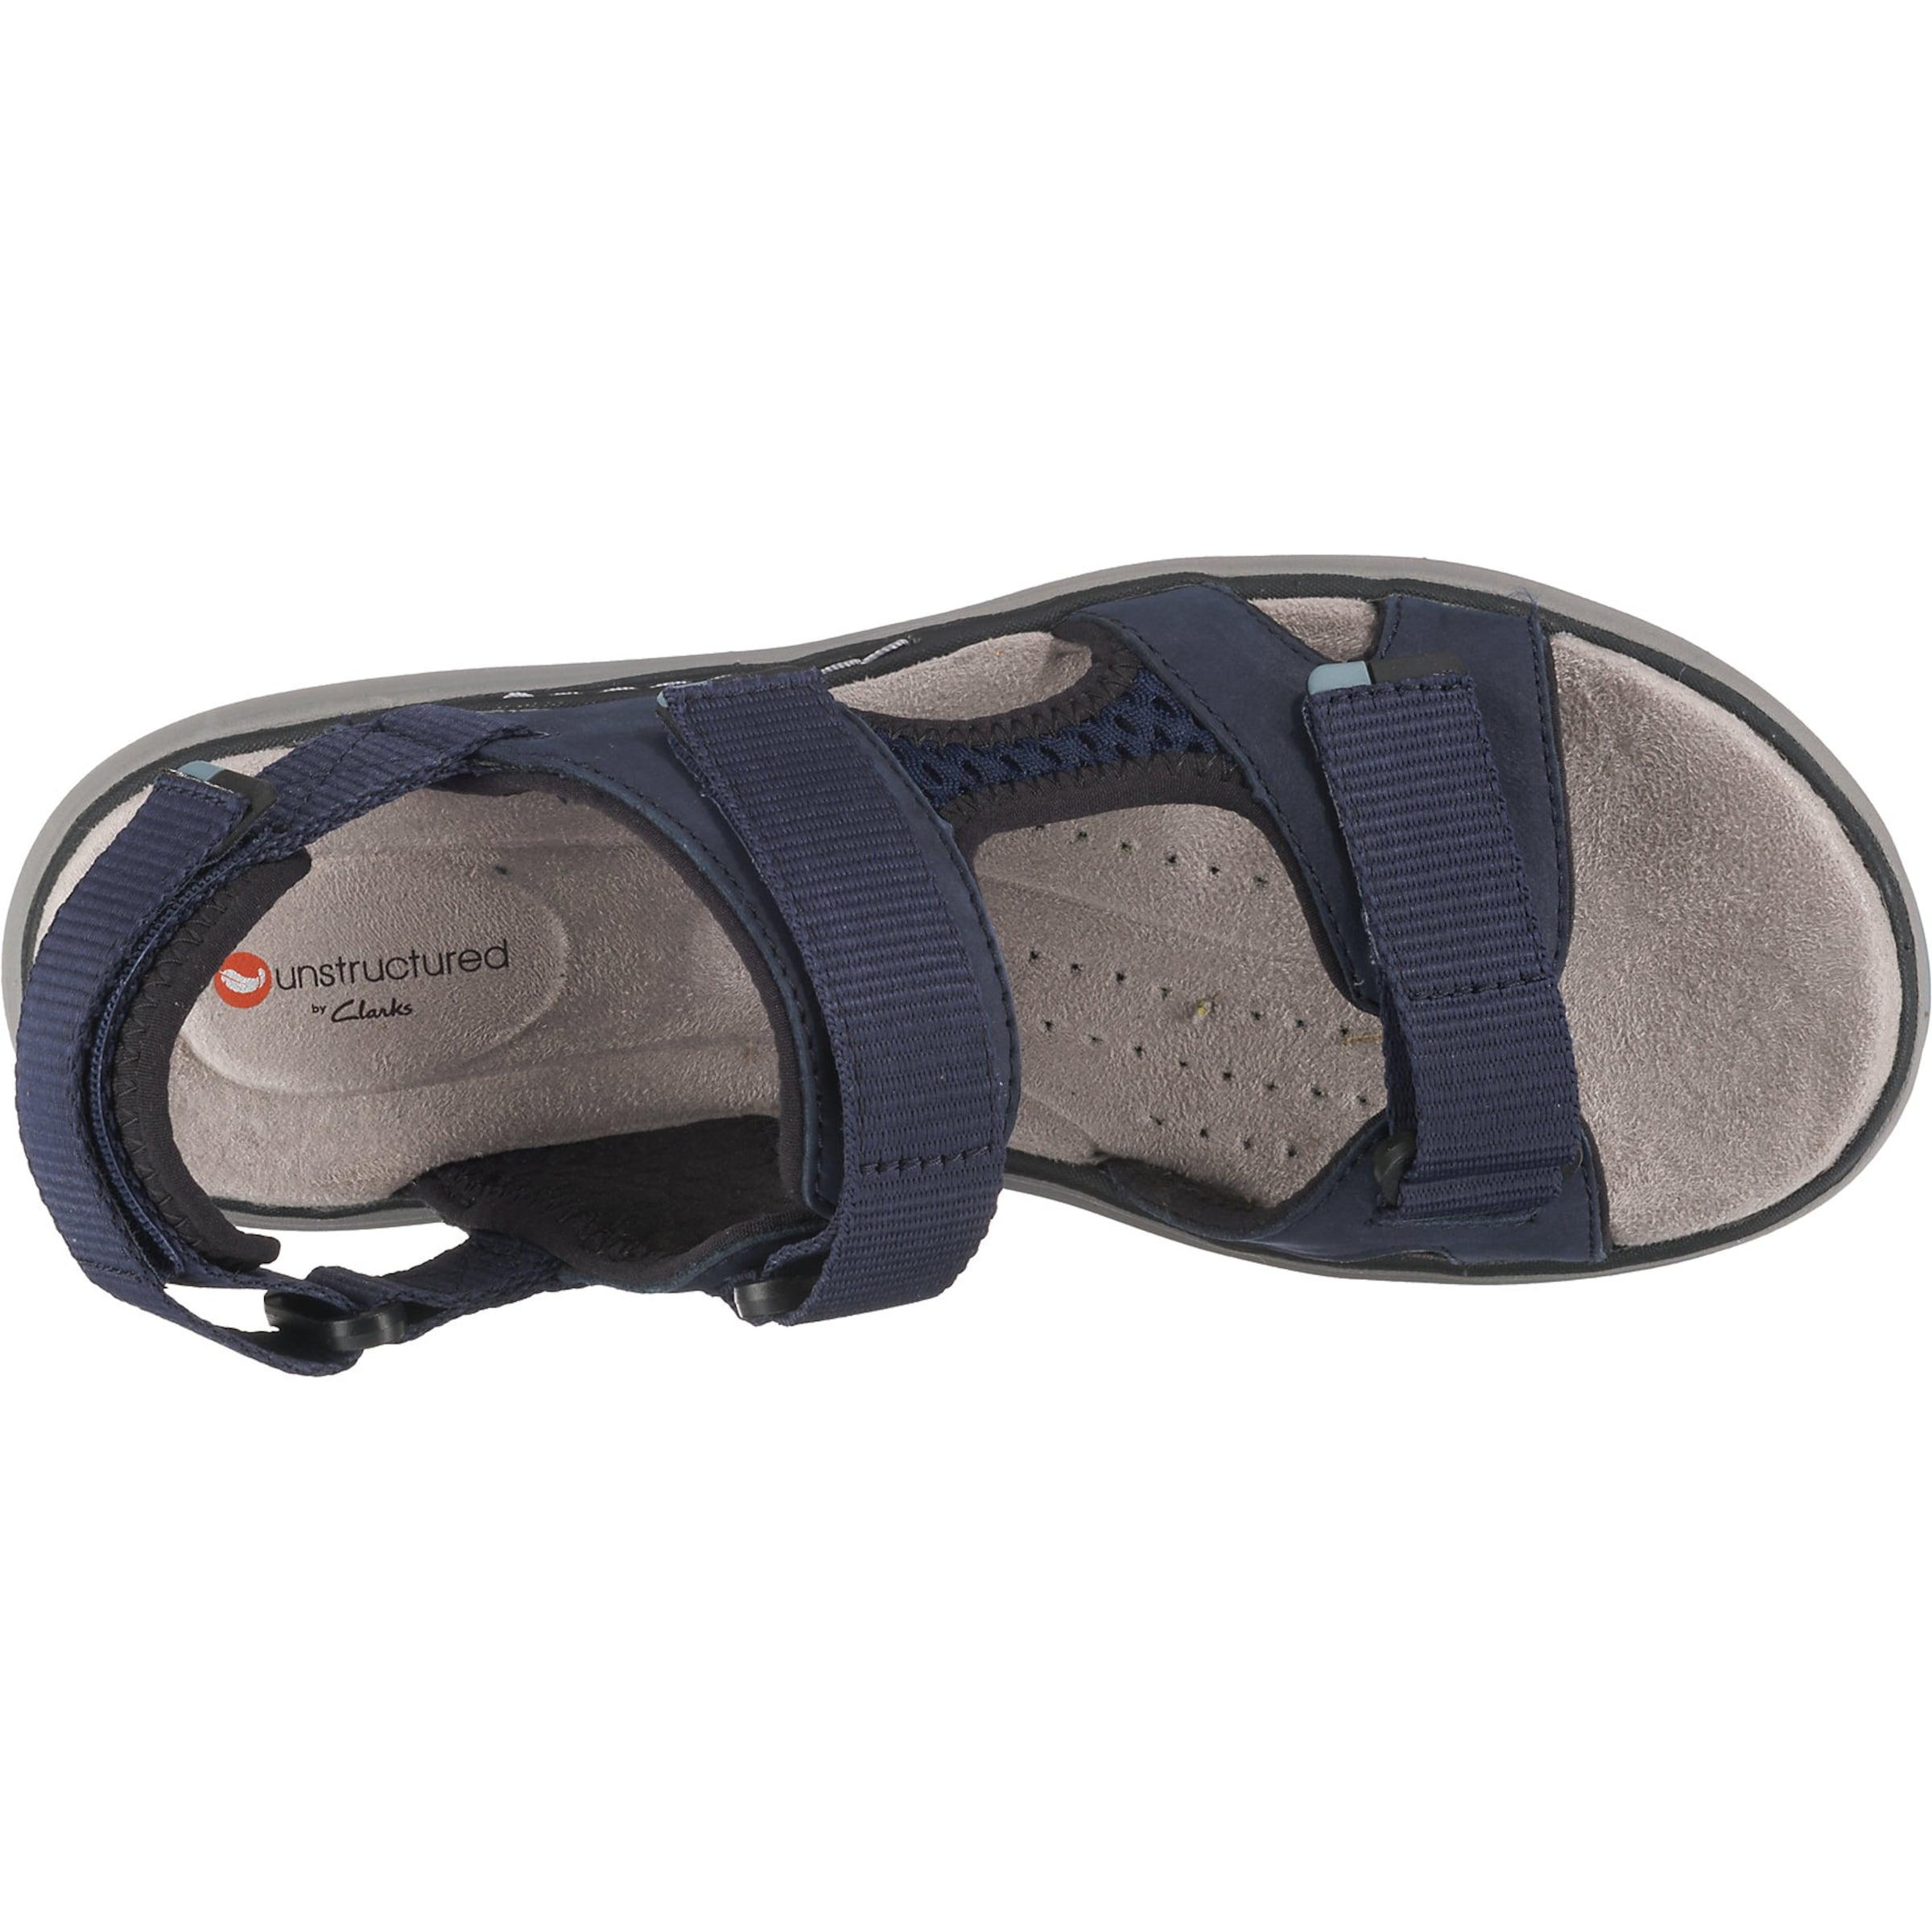 Sandalen 'un Step' In Dunkelblau Clarks Roam n8X0wPOk